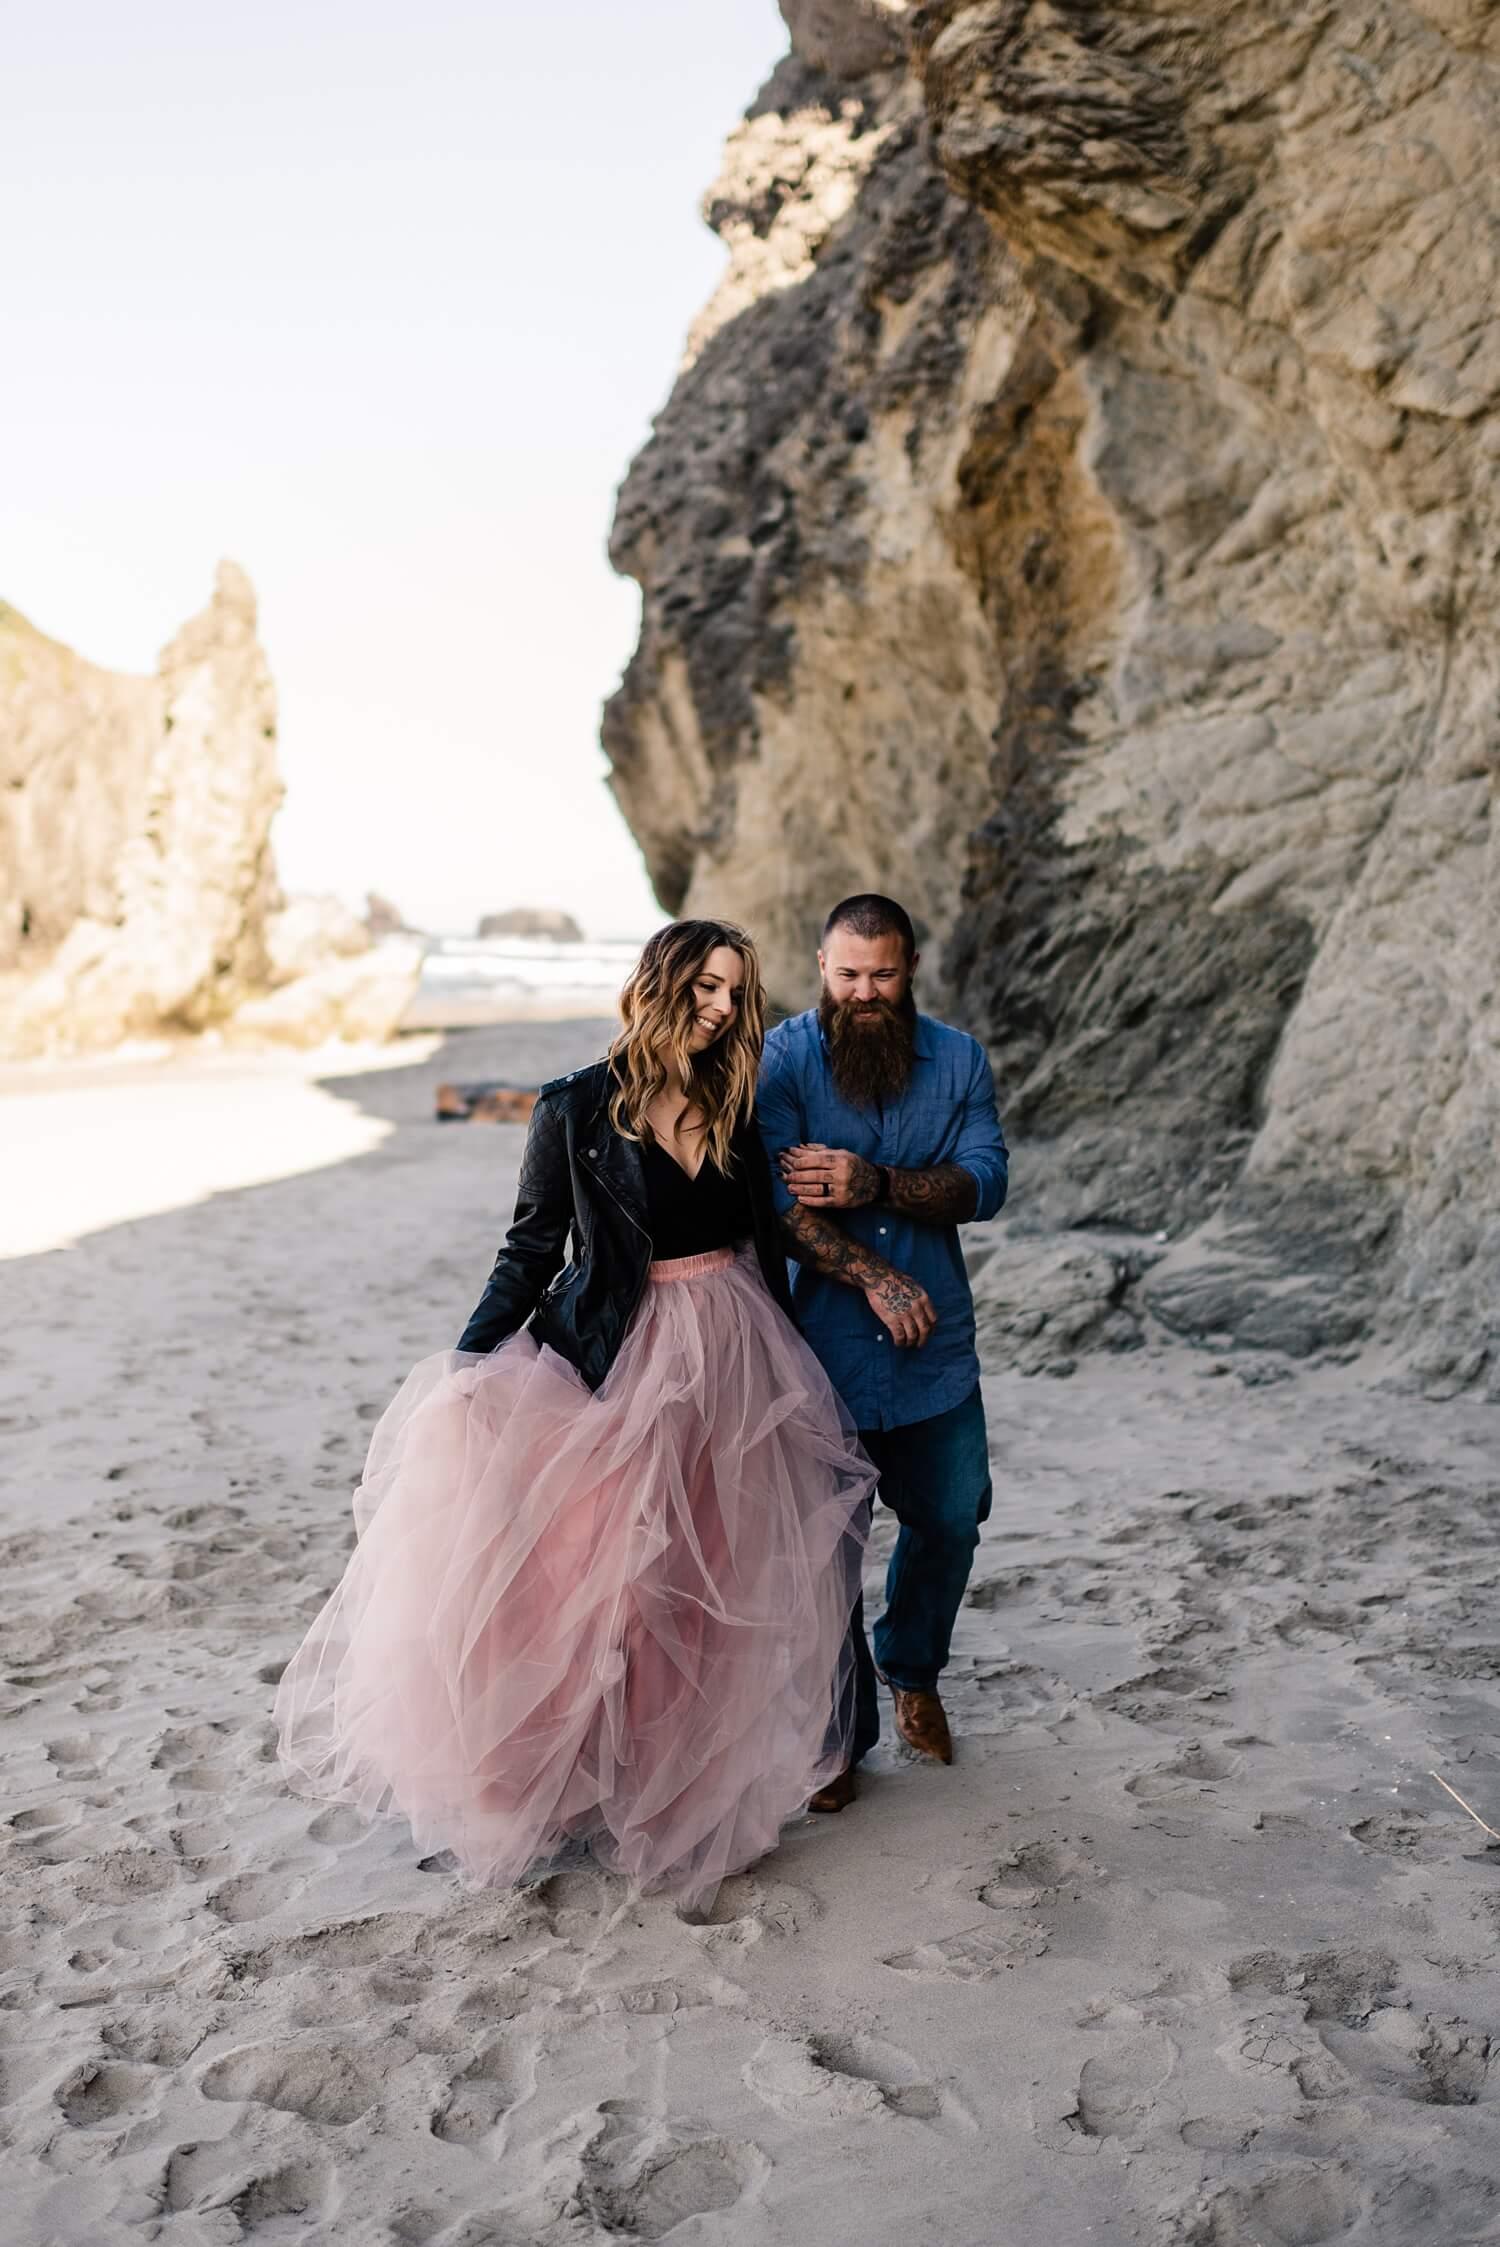 Bandon,adventure session,destination wedding,elope,engagement session,face rock,oregon coast,oregon elopement,oregon wedding photographer,pacific northwest,small wedding,